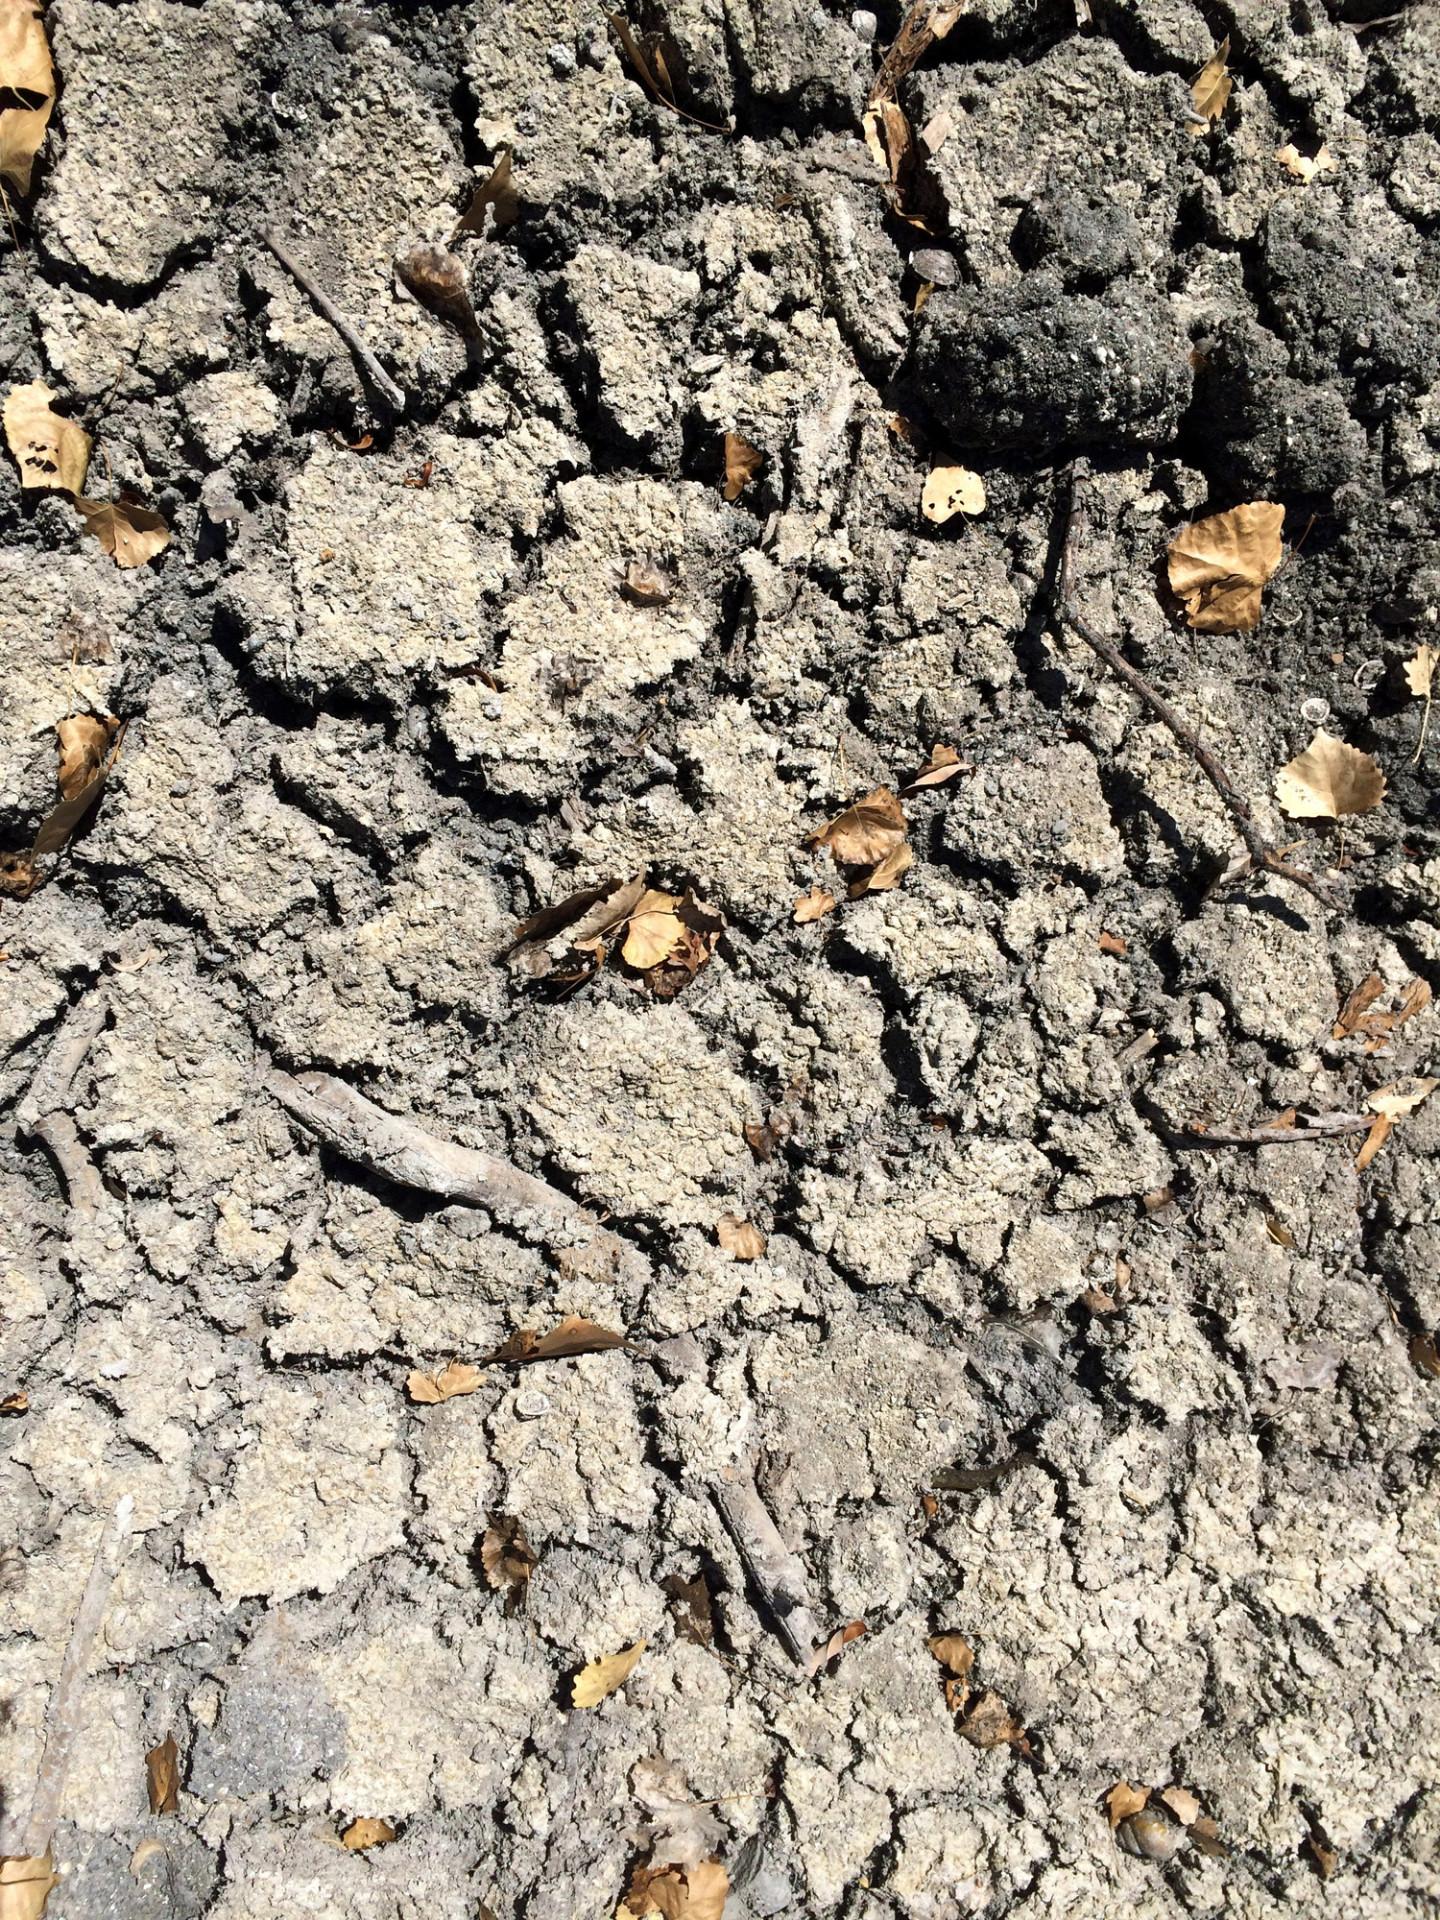 Shadow Cliffs, a Popular Pleasanton Park, Hit Hard by Drought